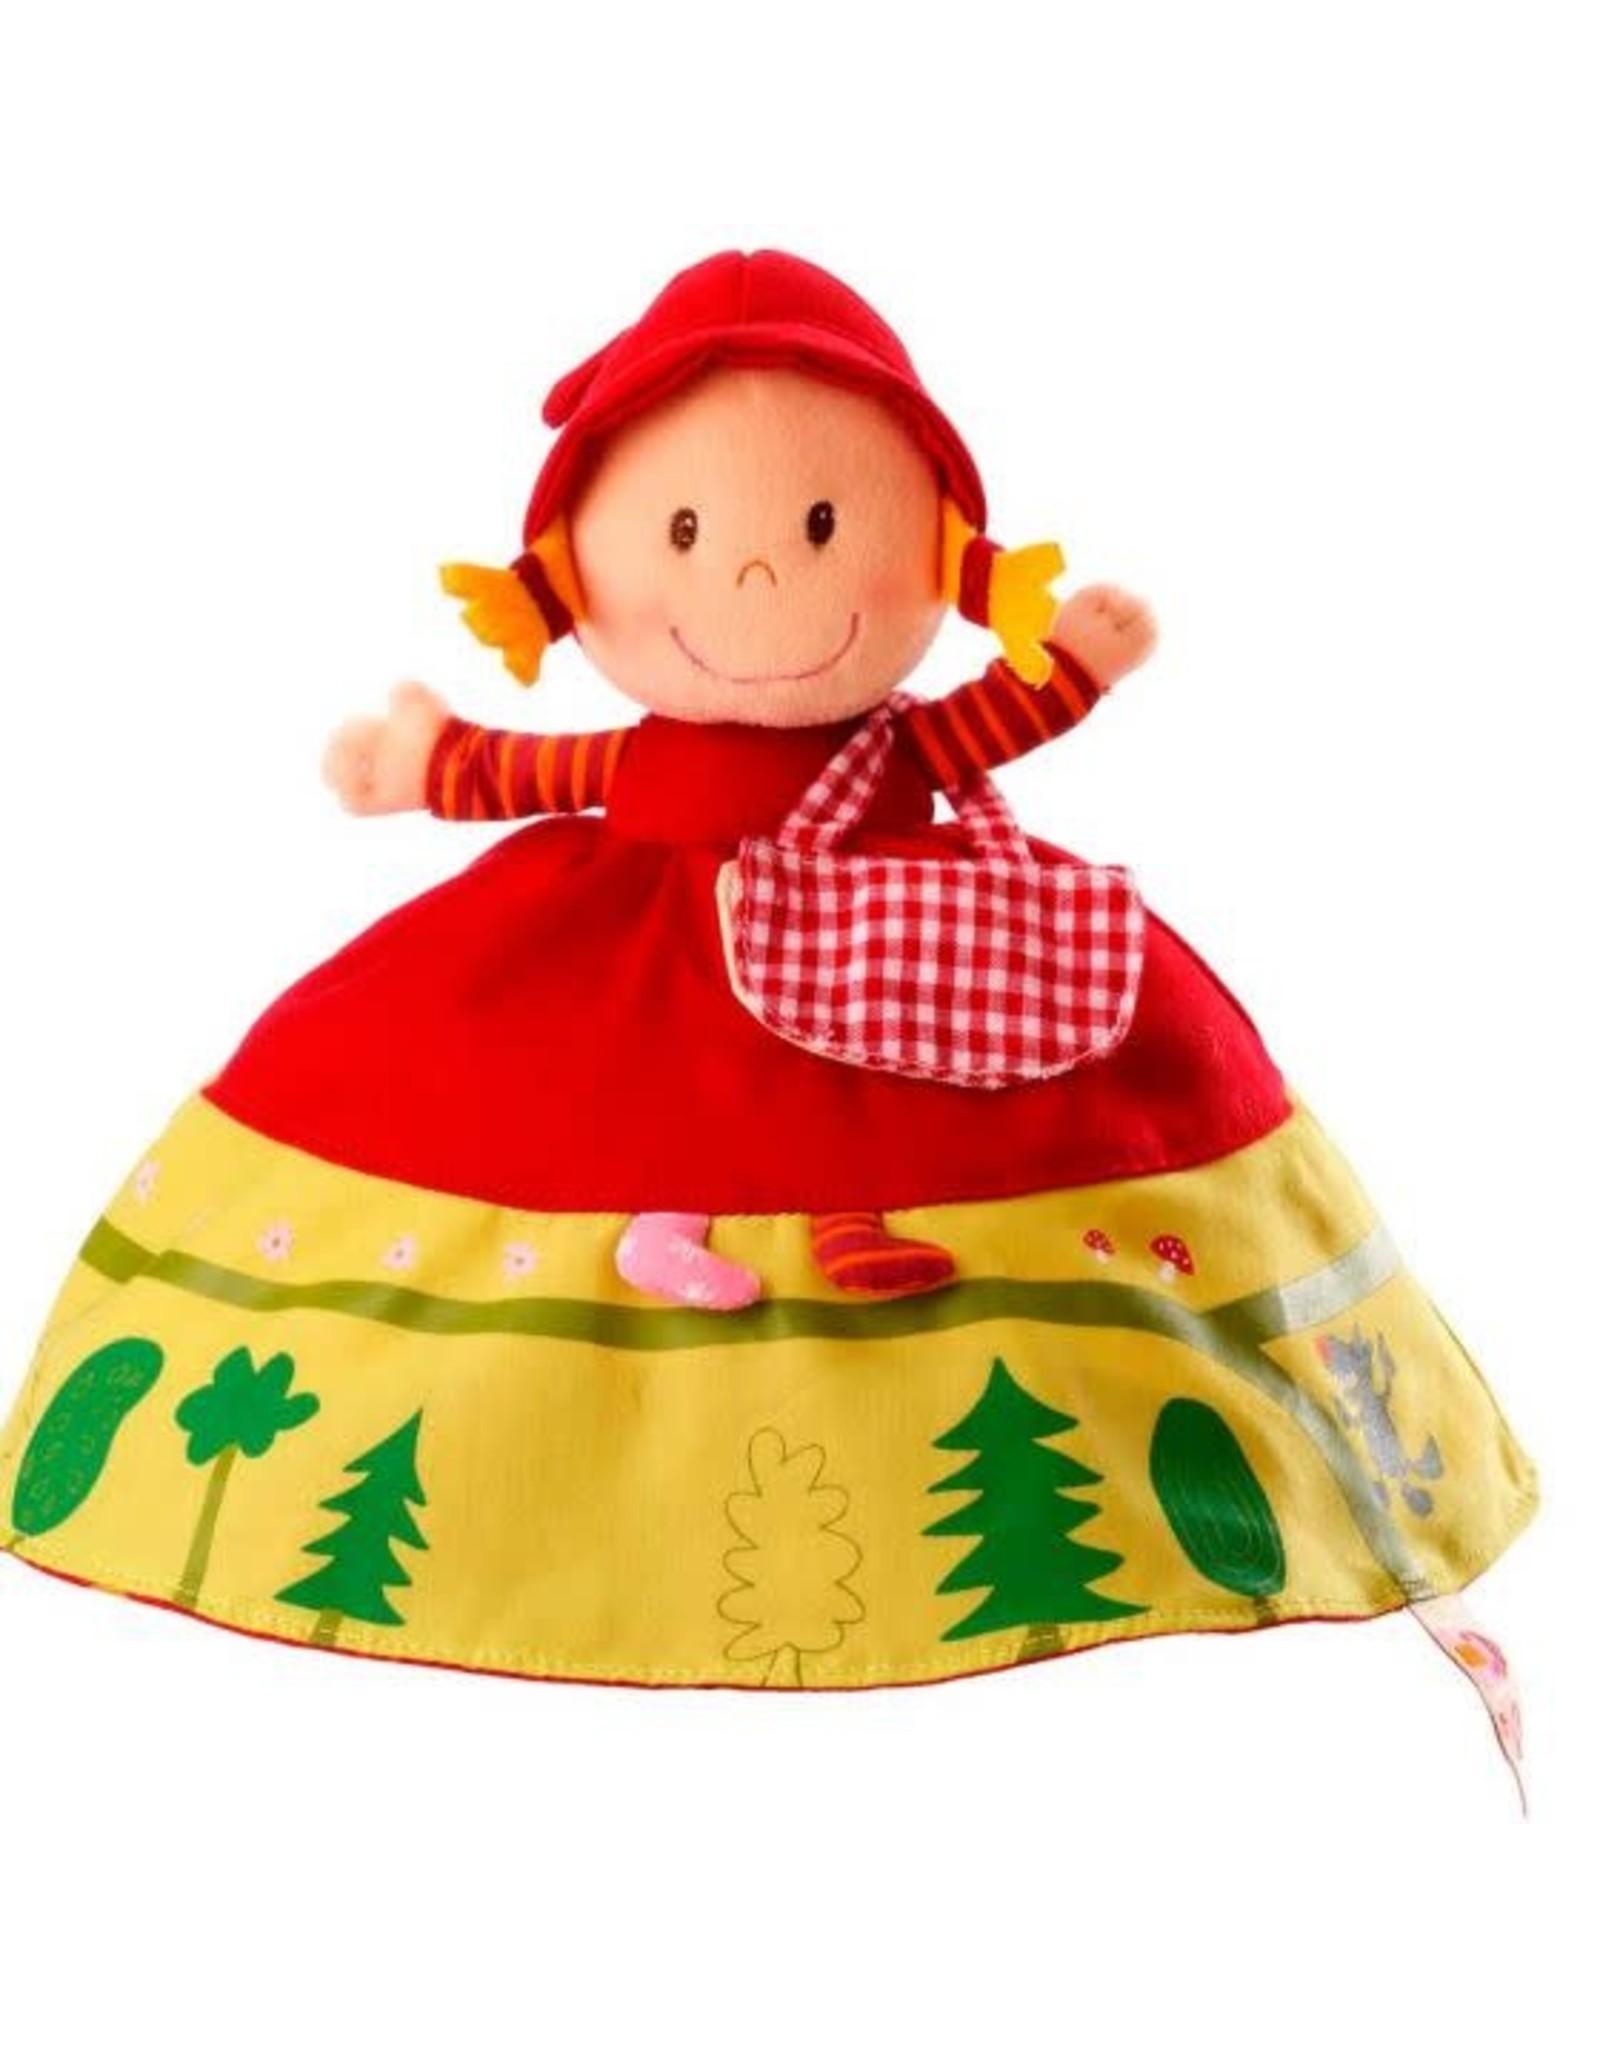 Lilliputiens Reversible Red Riding Hood Puppet